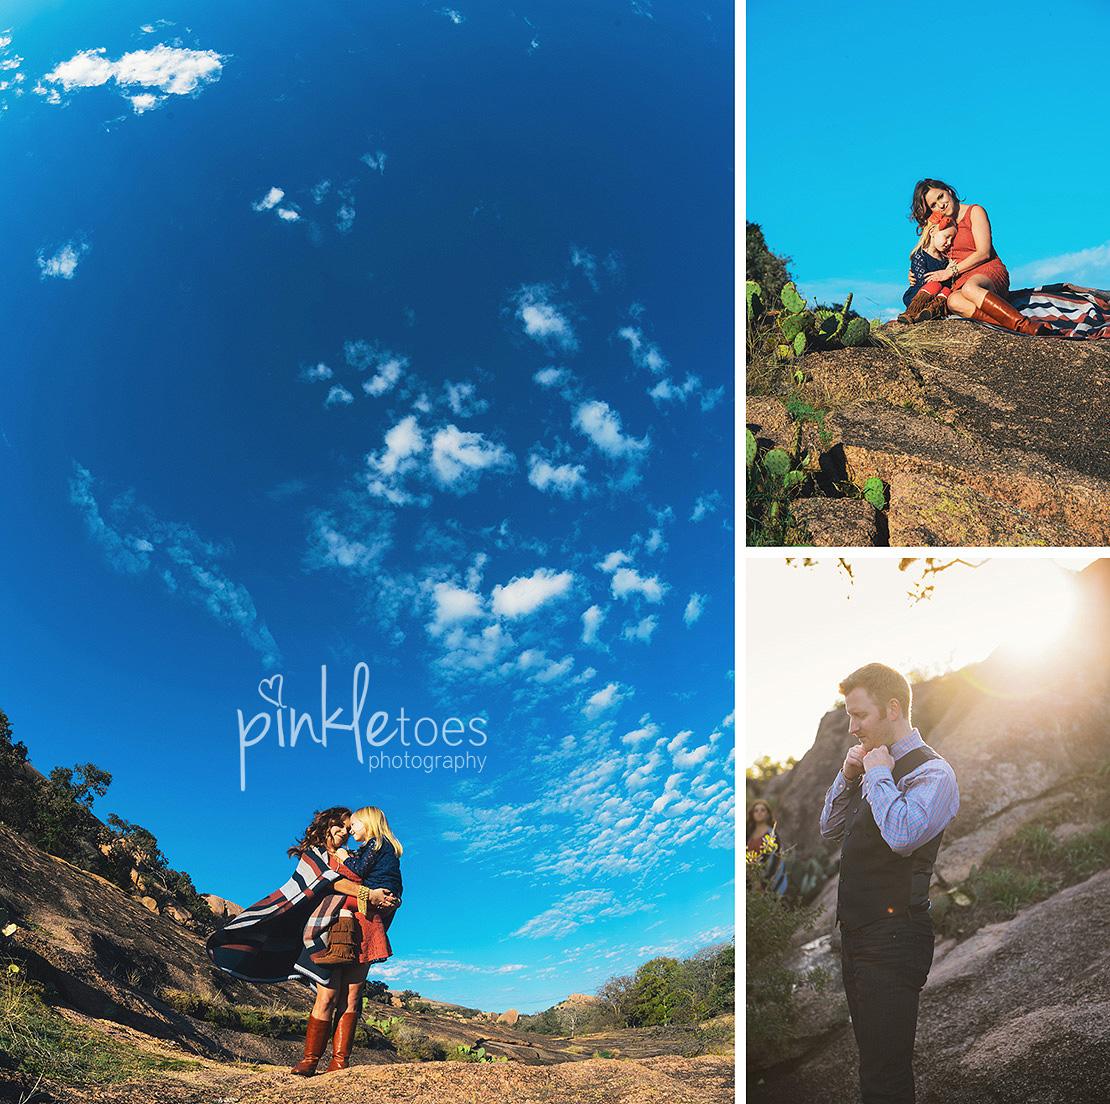 austin-desert-enchanted-rock-family-lifestyle-photography-04